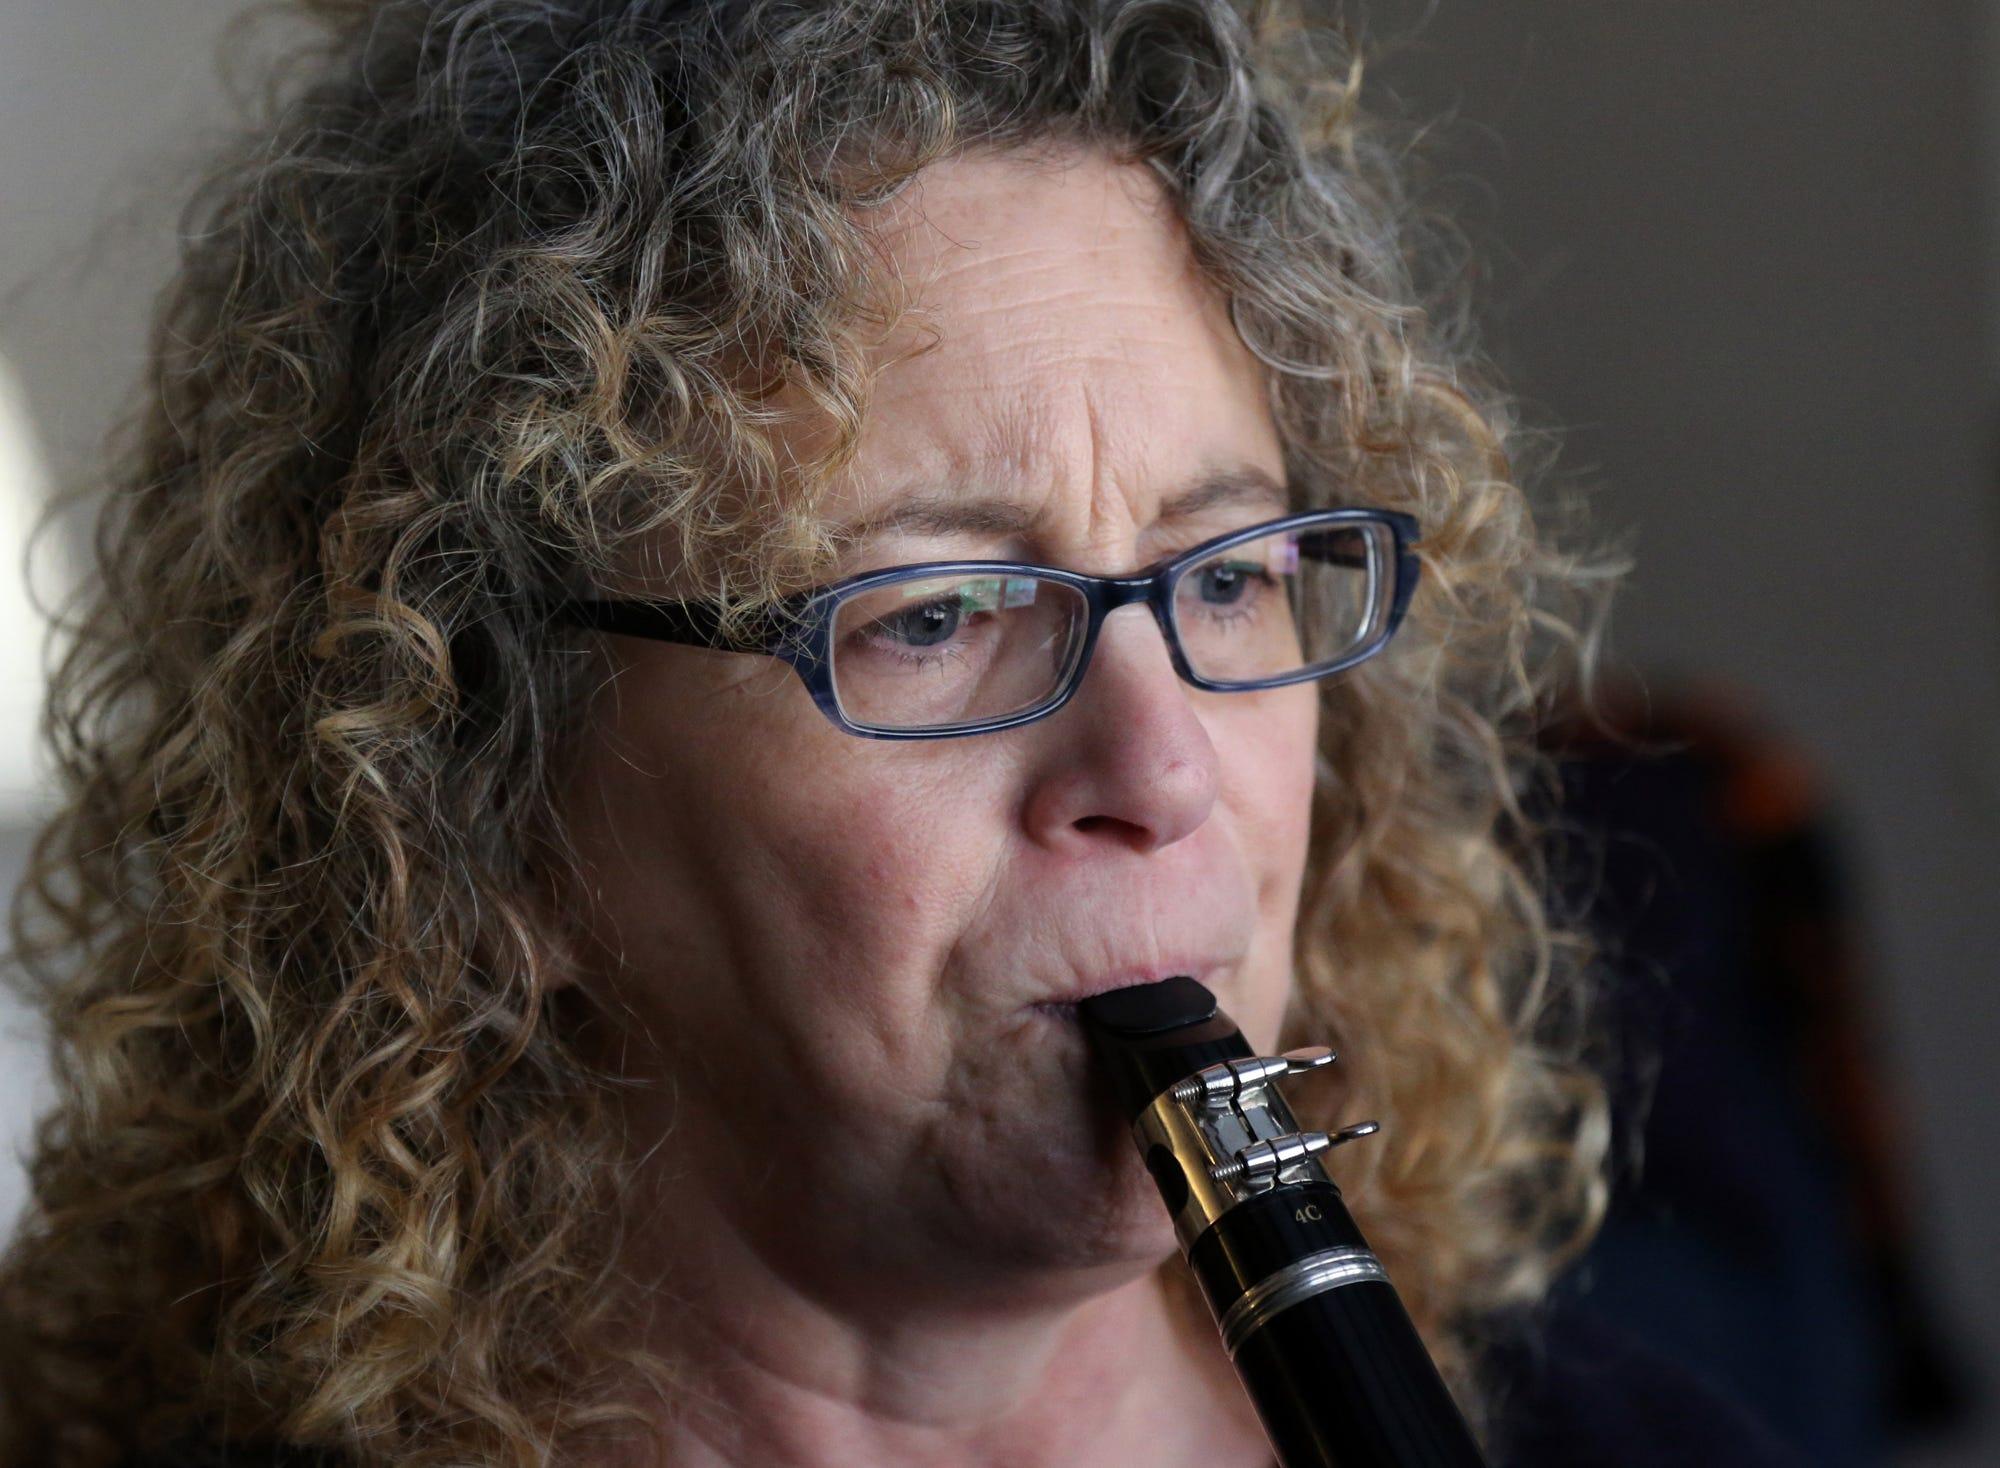 Sharon Morton, a member of the New Horizons Band